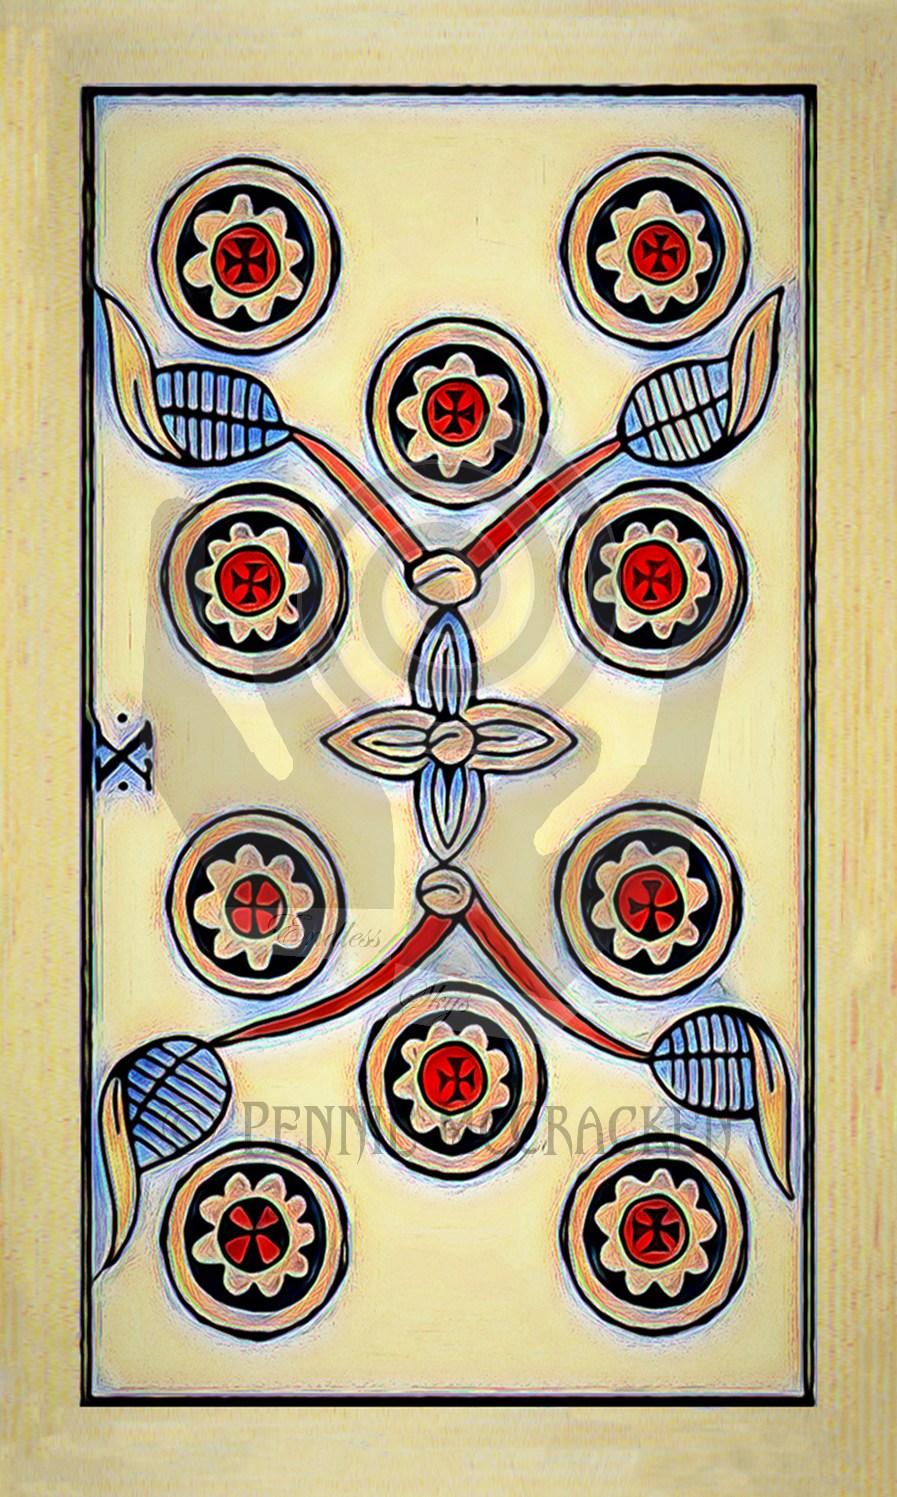 Tarot de Marseille in Colourful Grunge Design by Pennie McCracken - Endless Skys